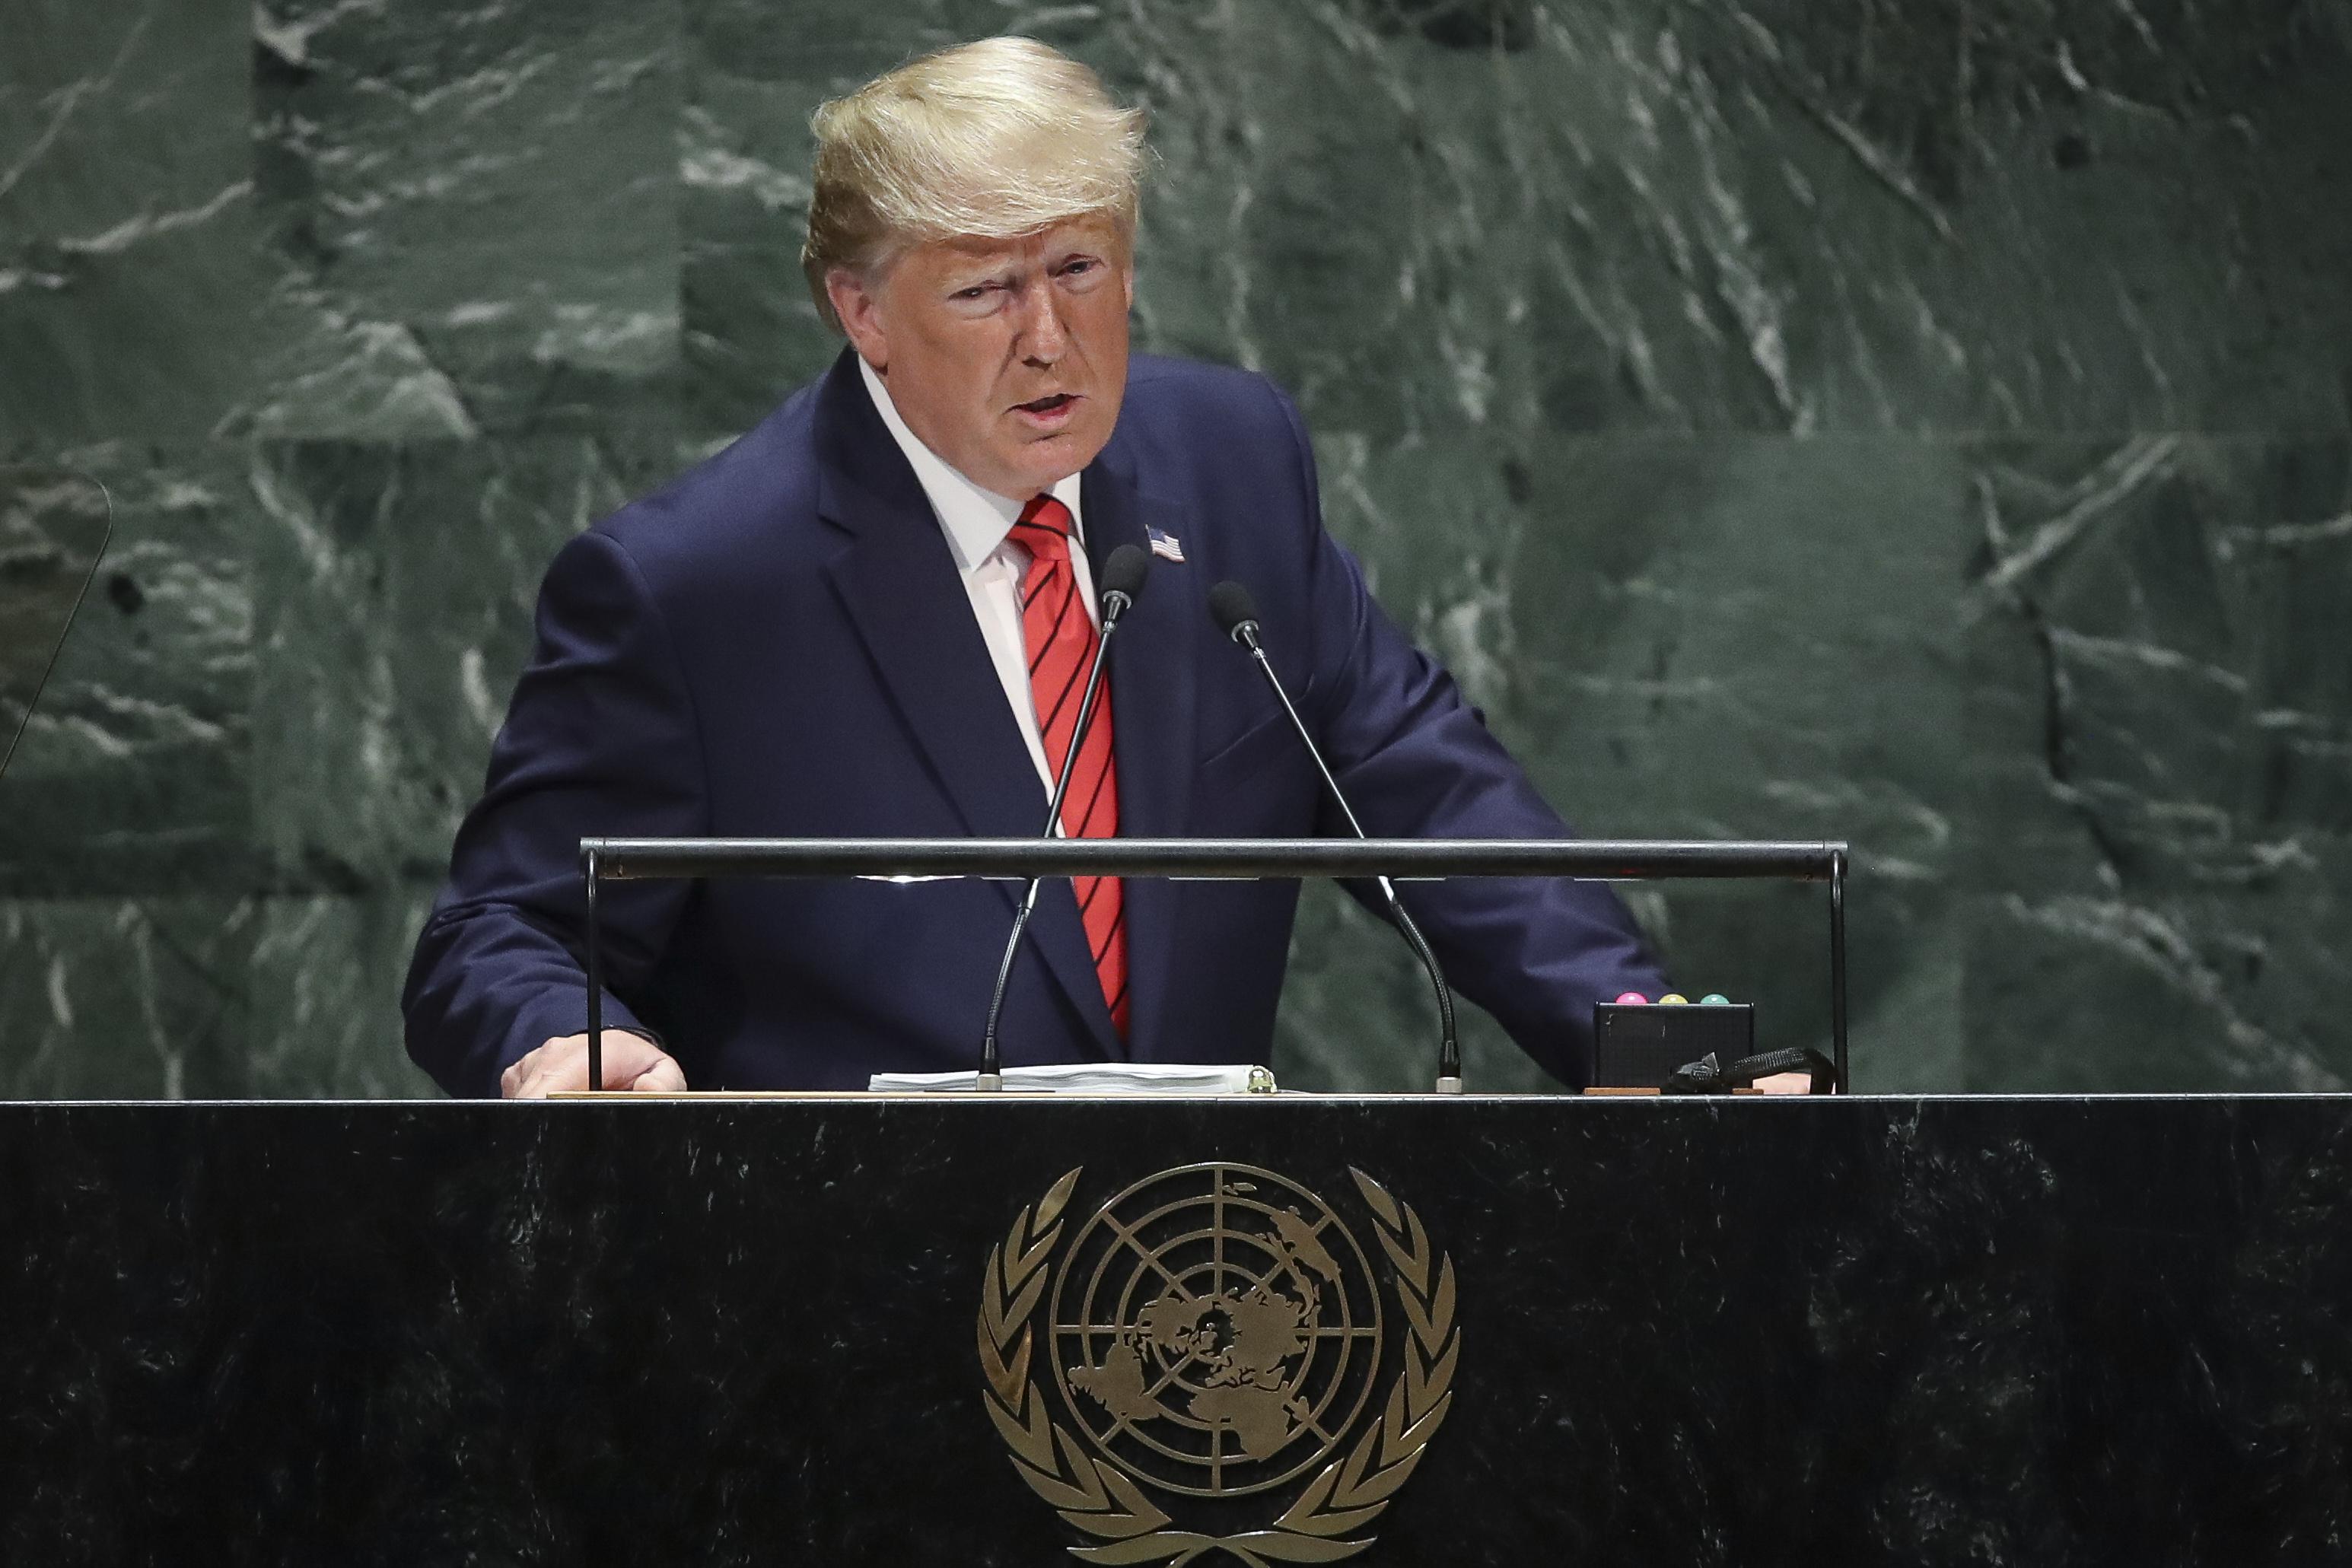 Donald Trump addresses the U.N.